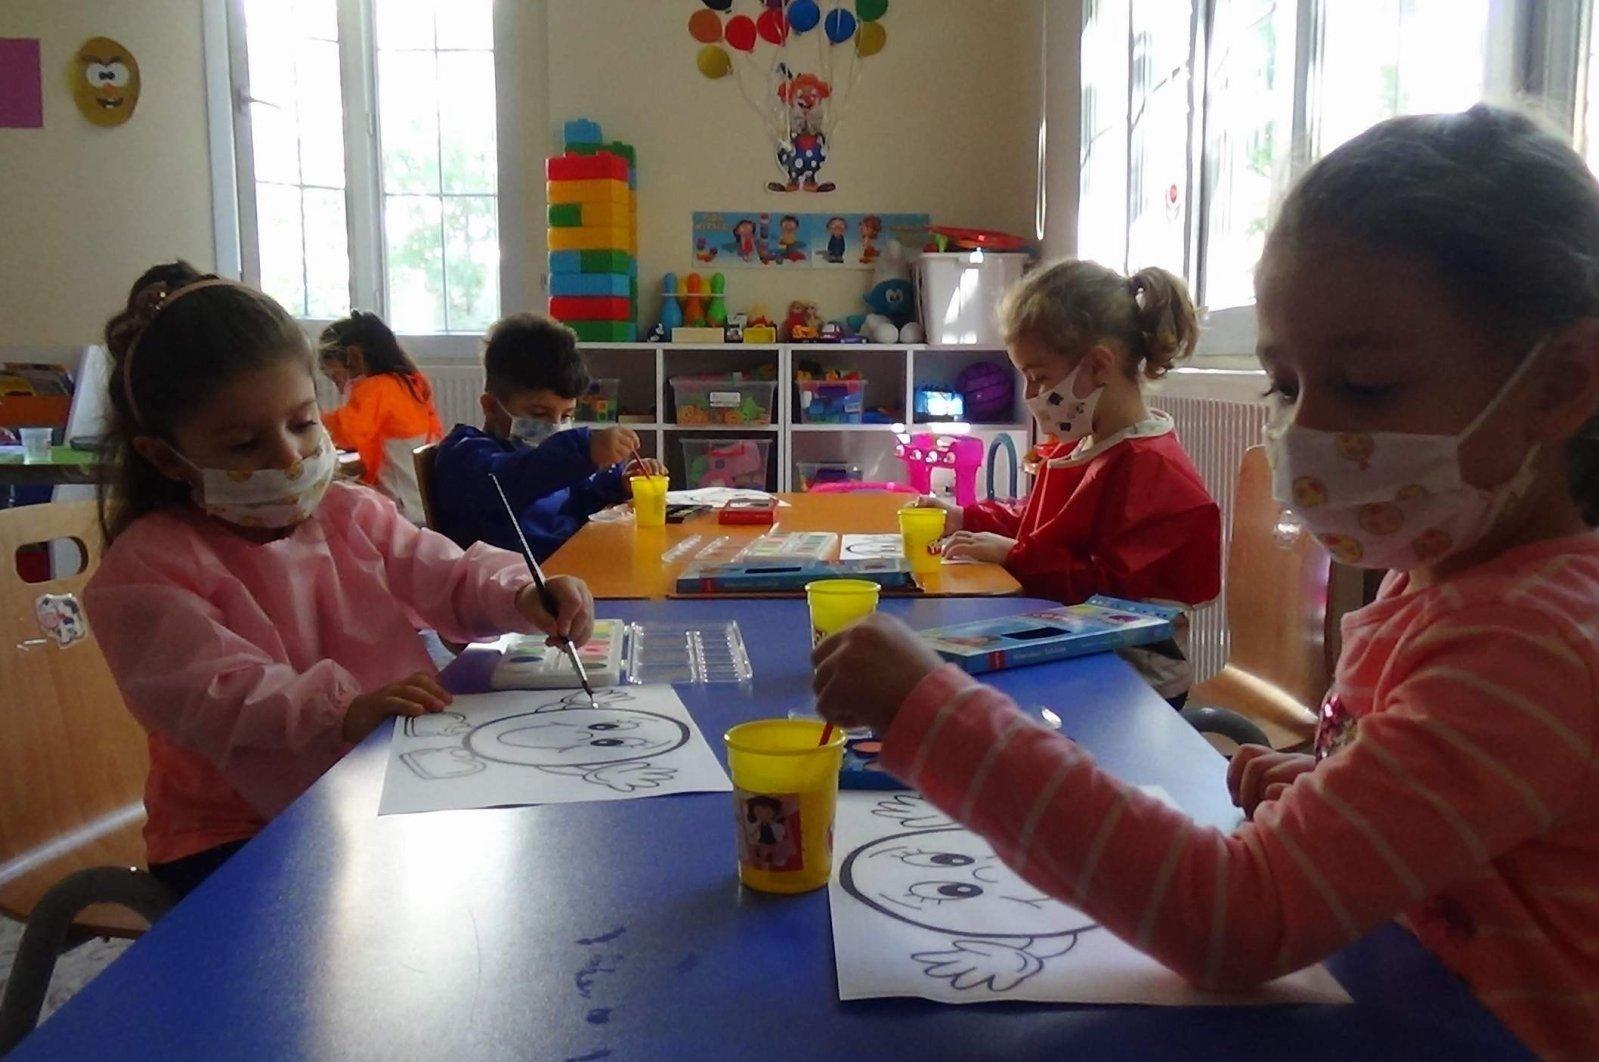 Preschool students at a school in Siirt, eastern Turkey, Oct. 21, 2020. (IHA Photo)